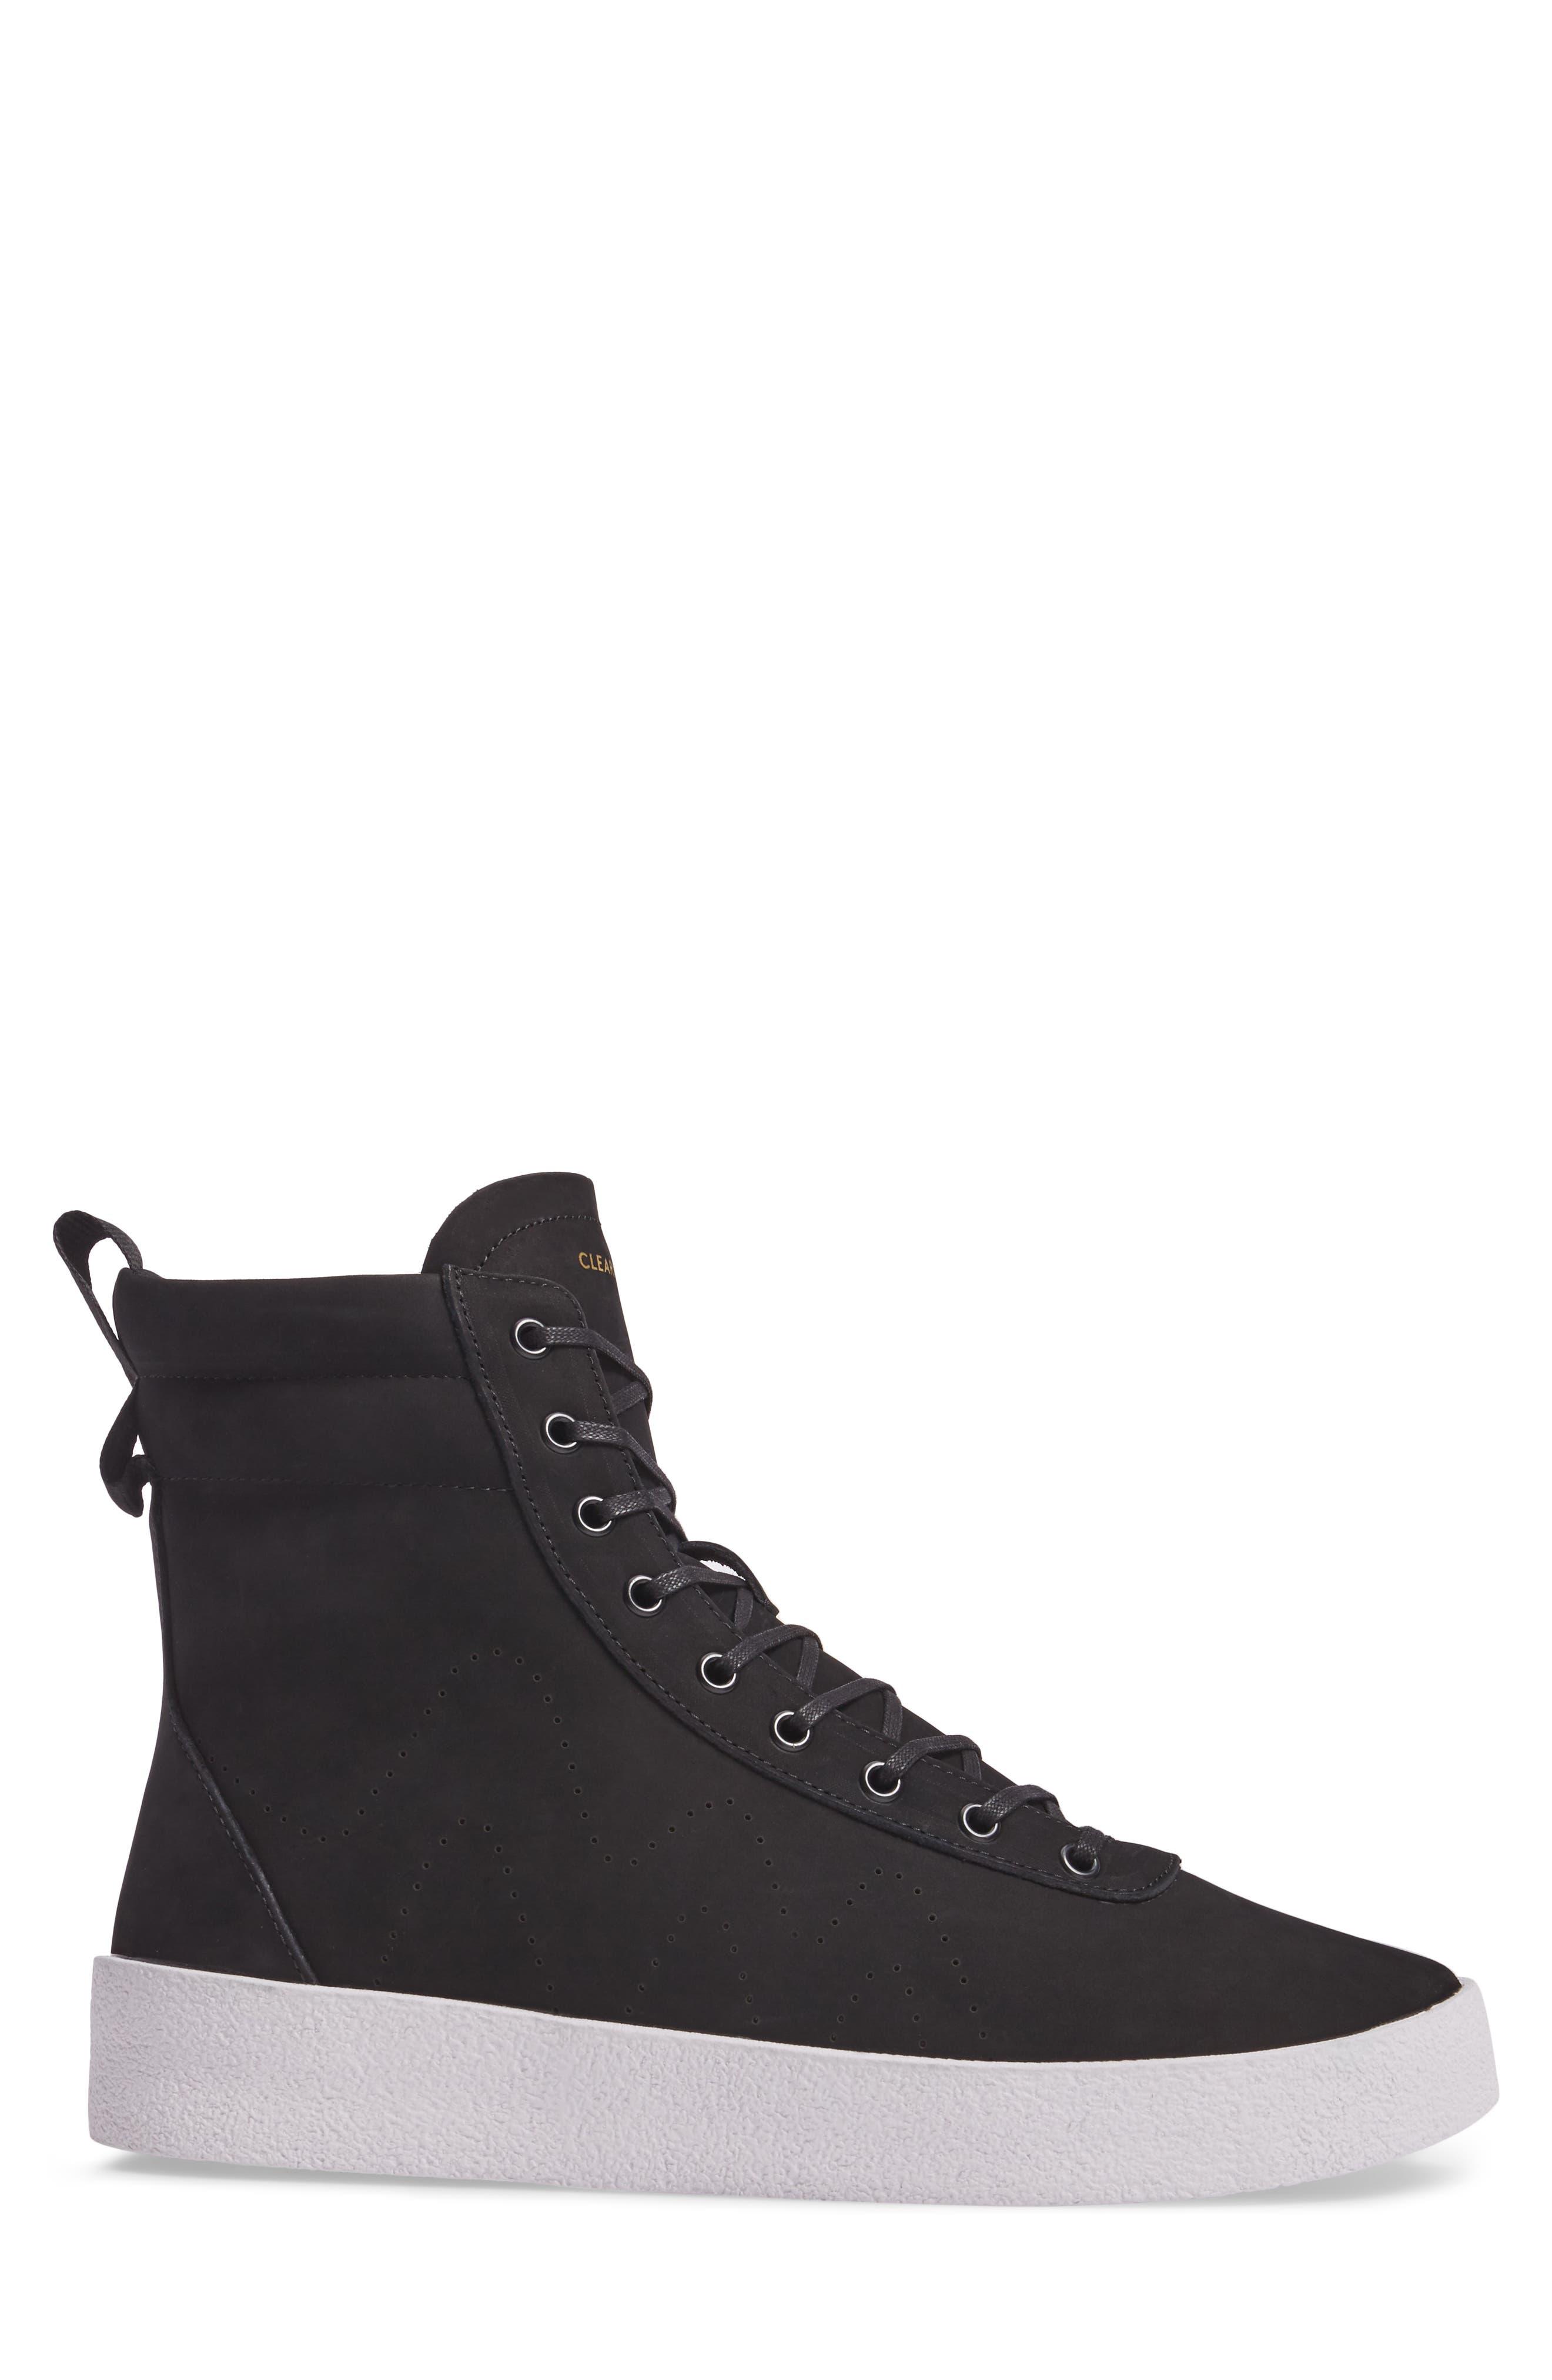 Highlander High Top Sneaker,                             Alternate thumbnail 3, color,                             001